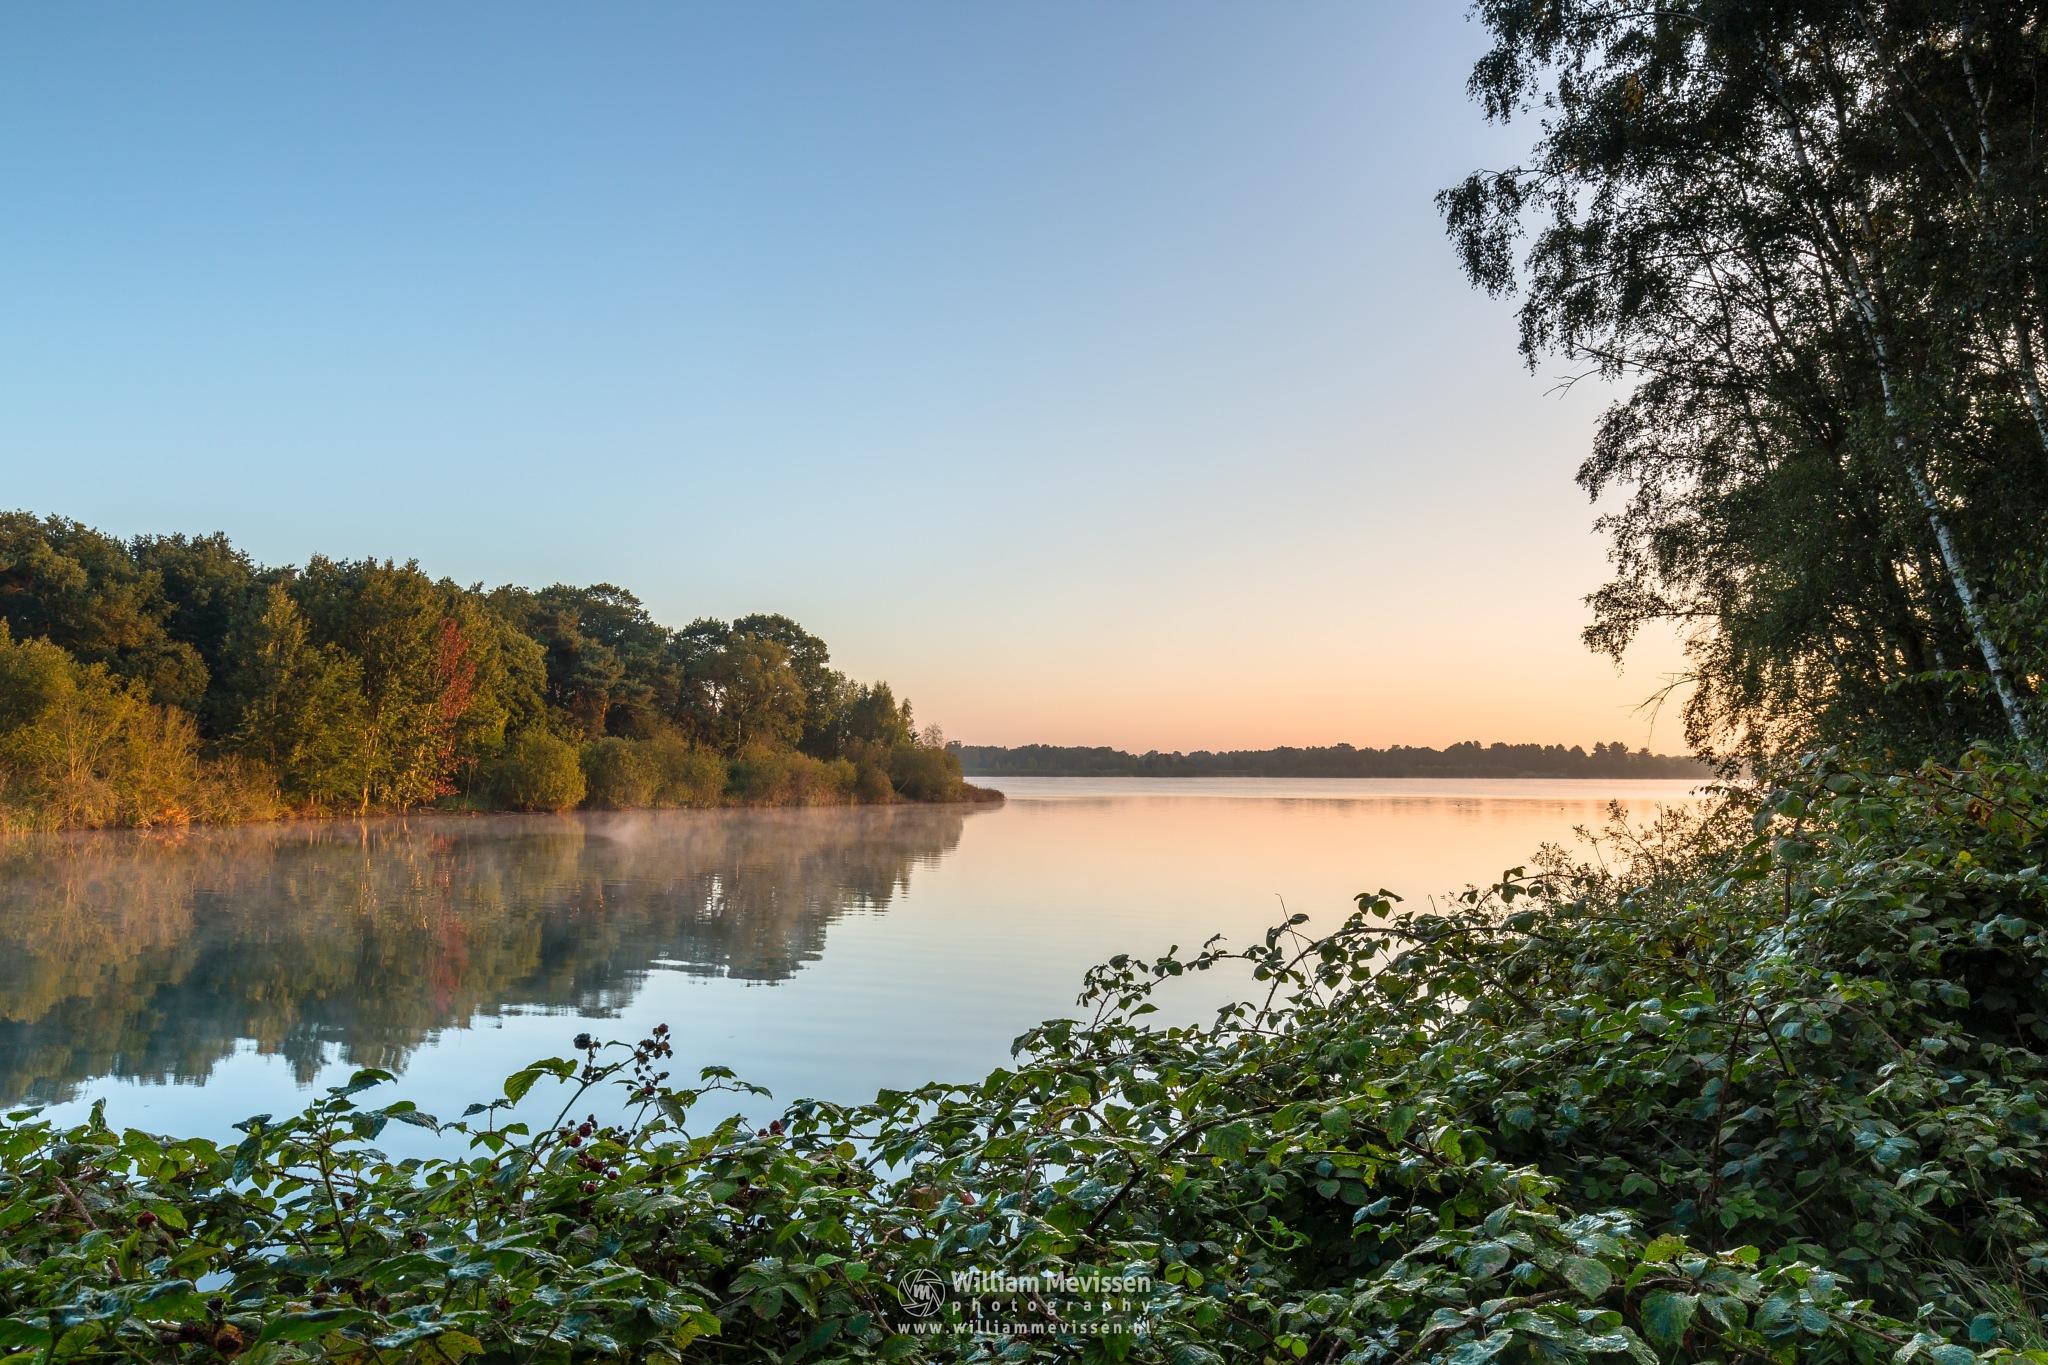 Bay View Reindersmeer  by William Mevissen